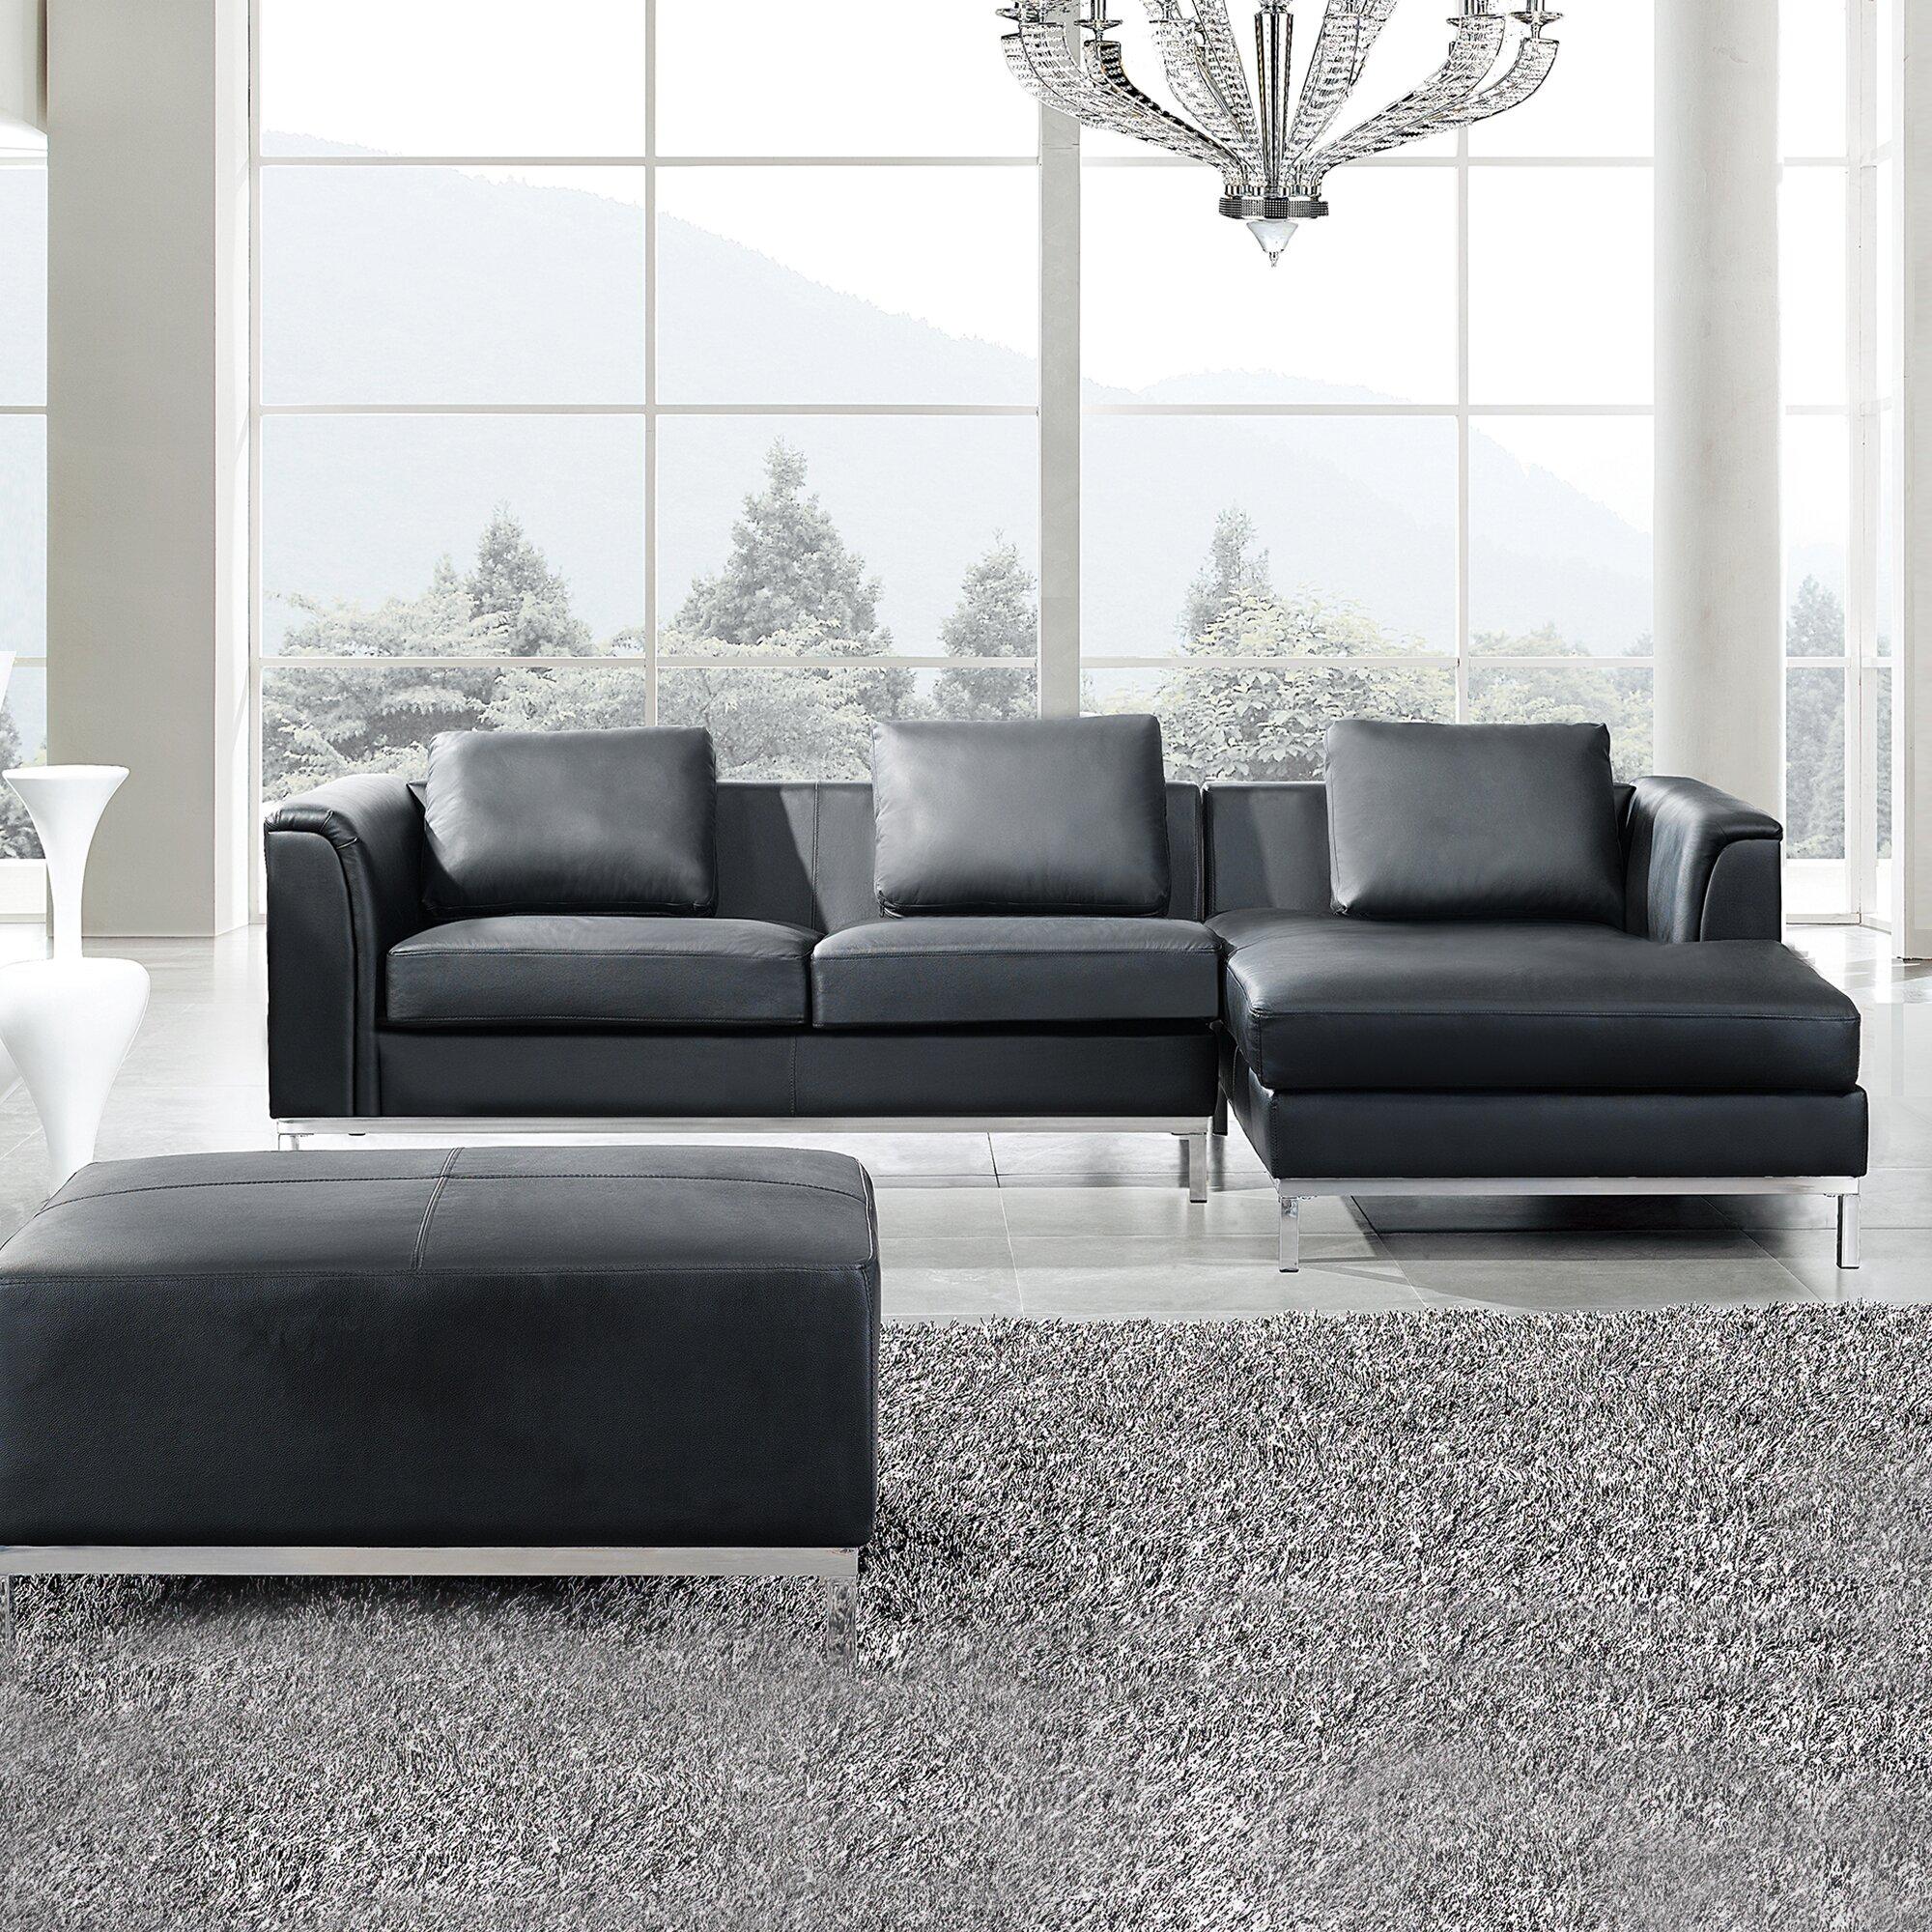 Beliani oslo 3 piece leather living room set reviews for 3 piece leather living room set